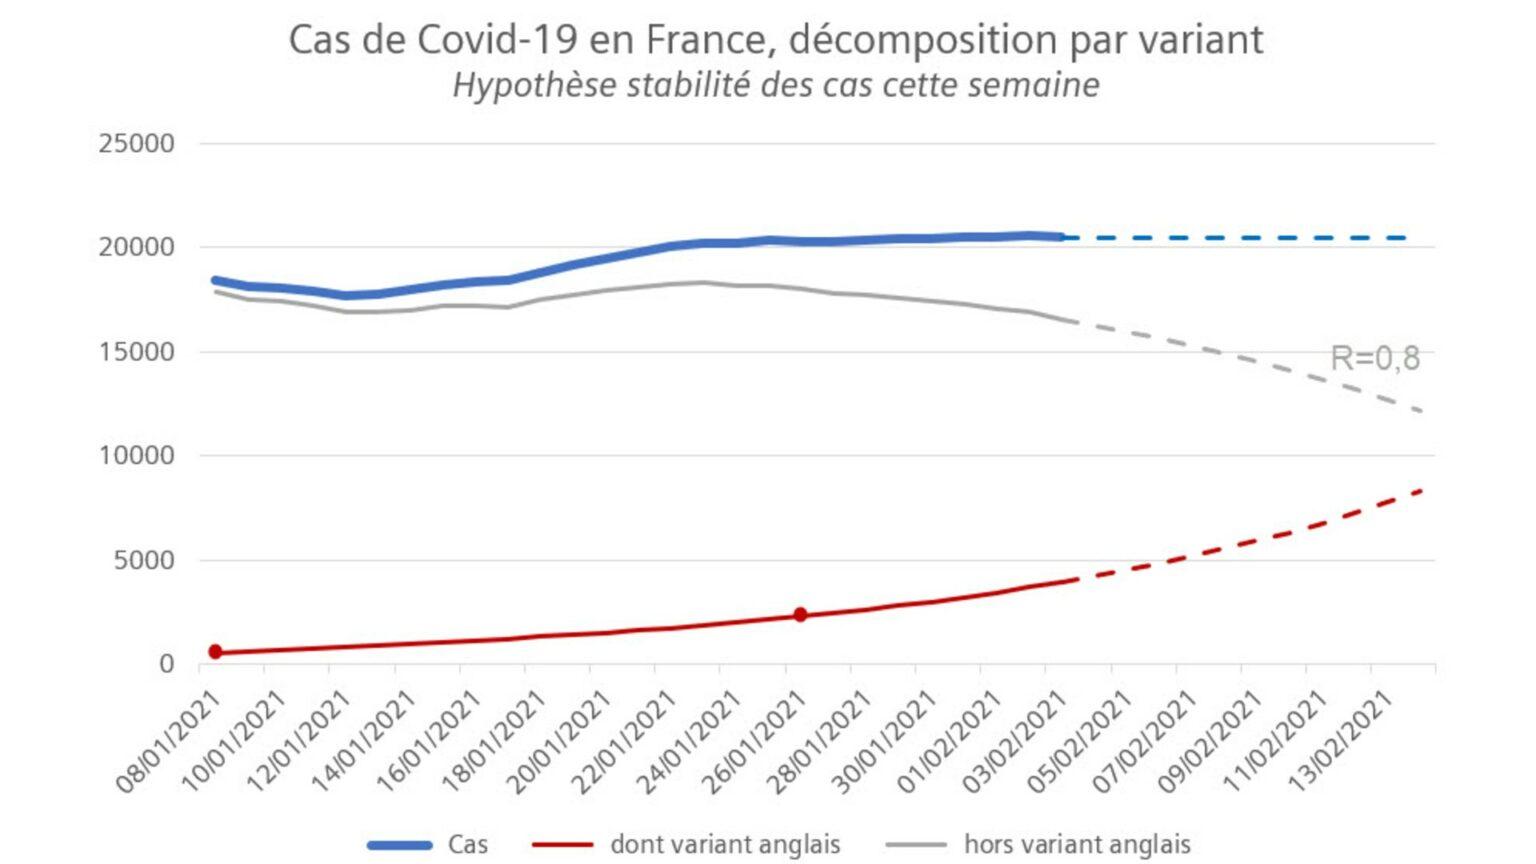 coronavirus variant France graph 4